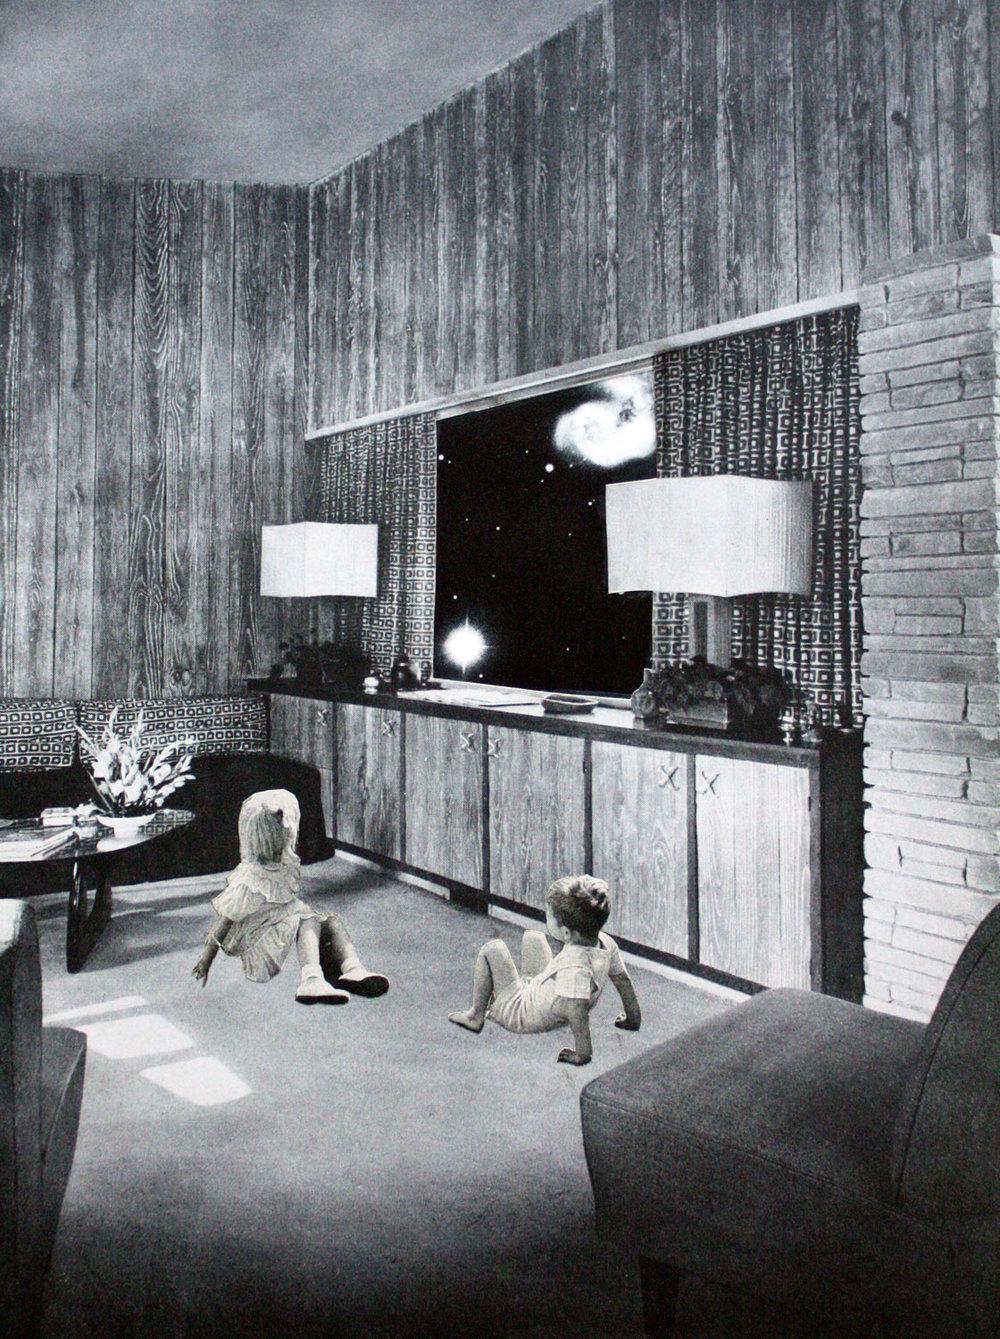 Space Room II